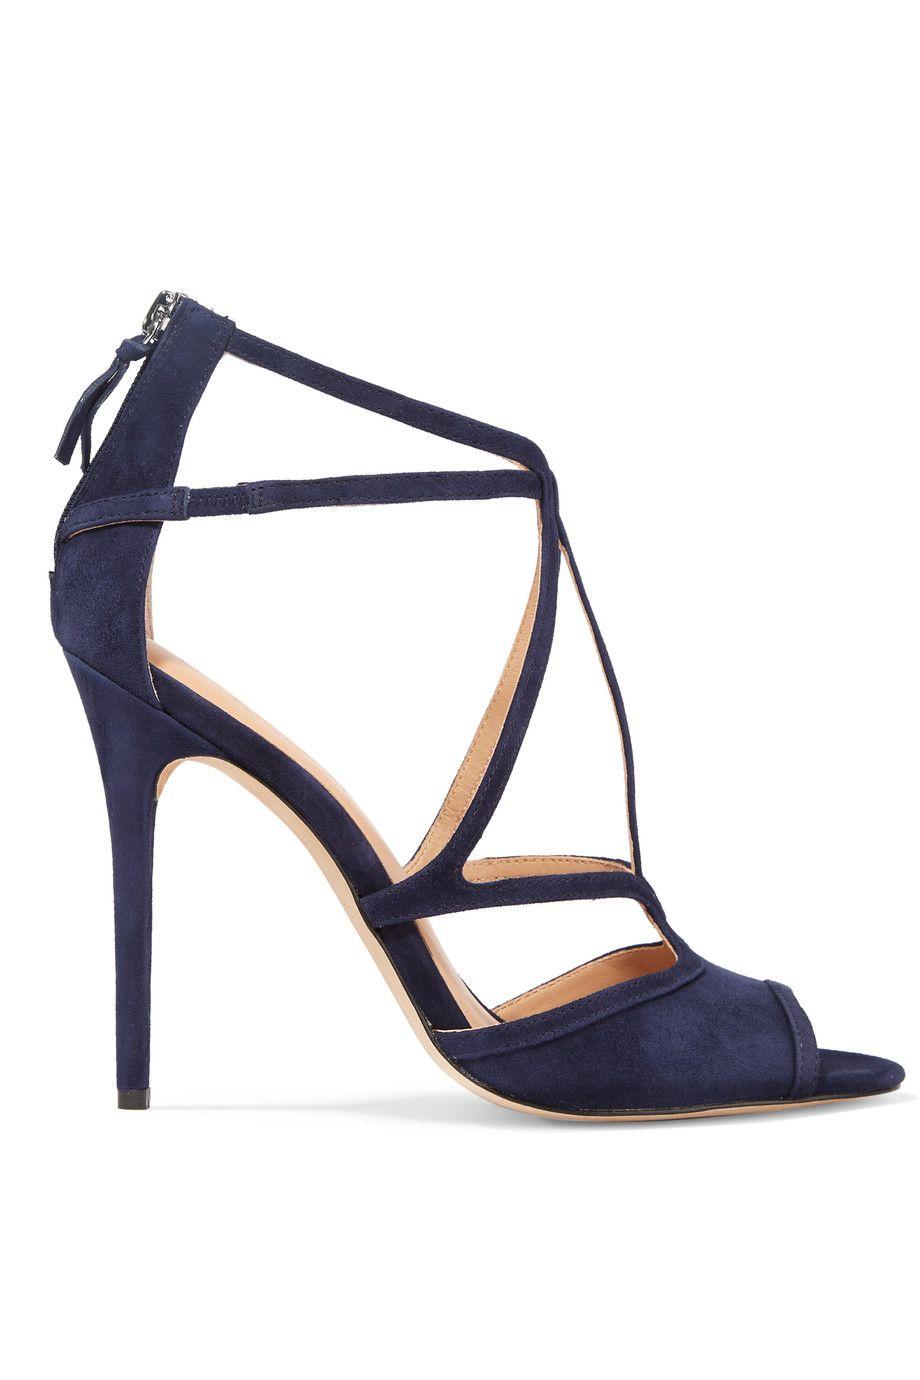 317b3f36ca2 Halston 'Monica' Navy Suede T-Strap Sandal | Adorable Shoes ...